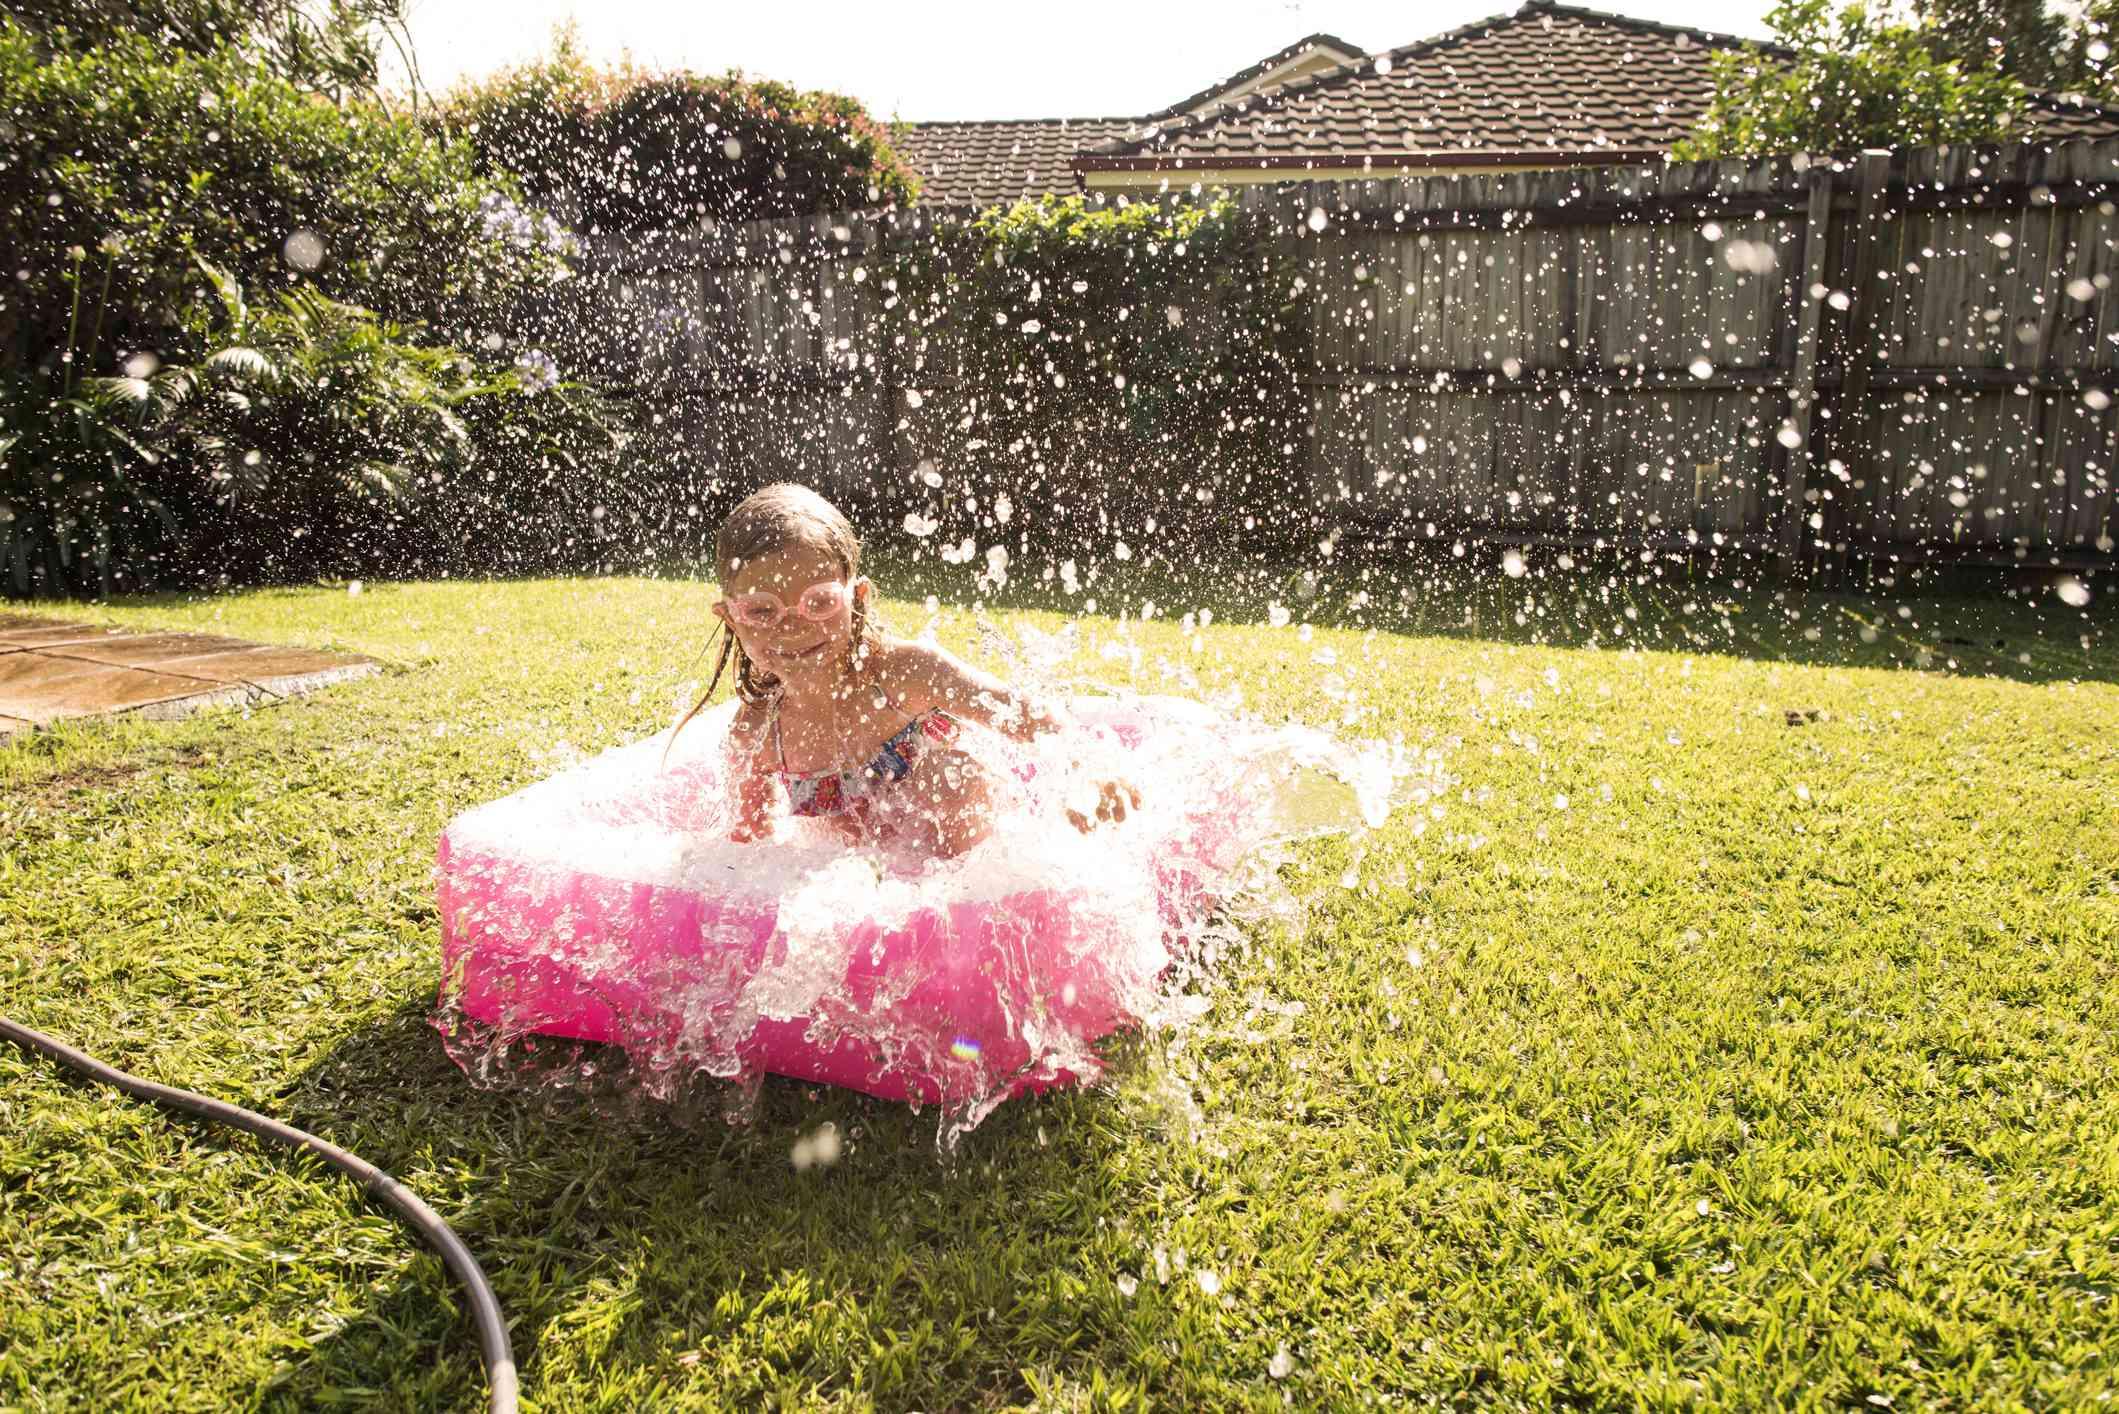 Girl in Australian backyard baby pool splashing